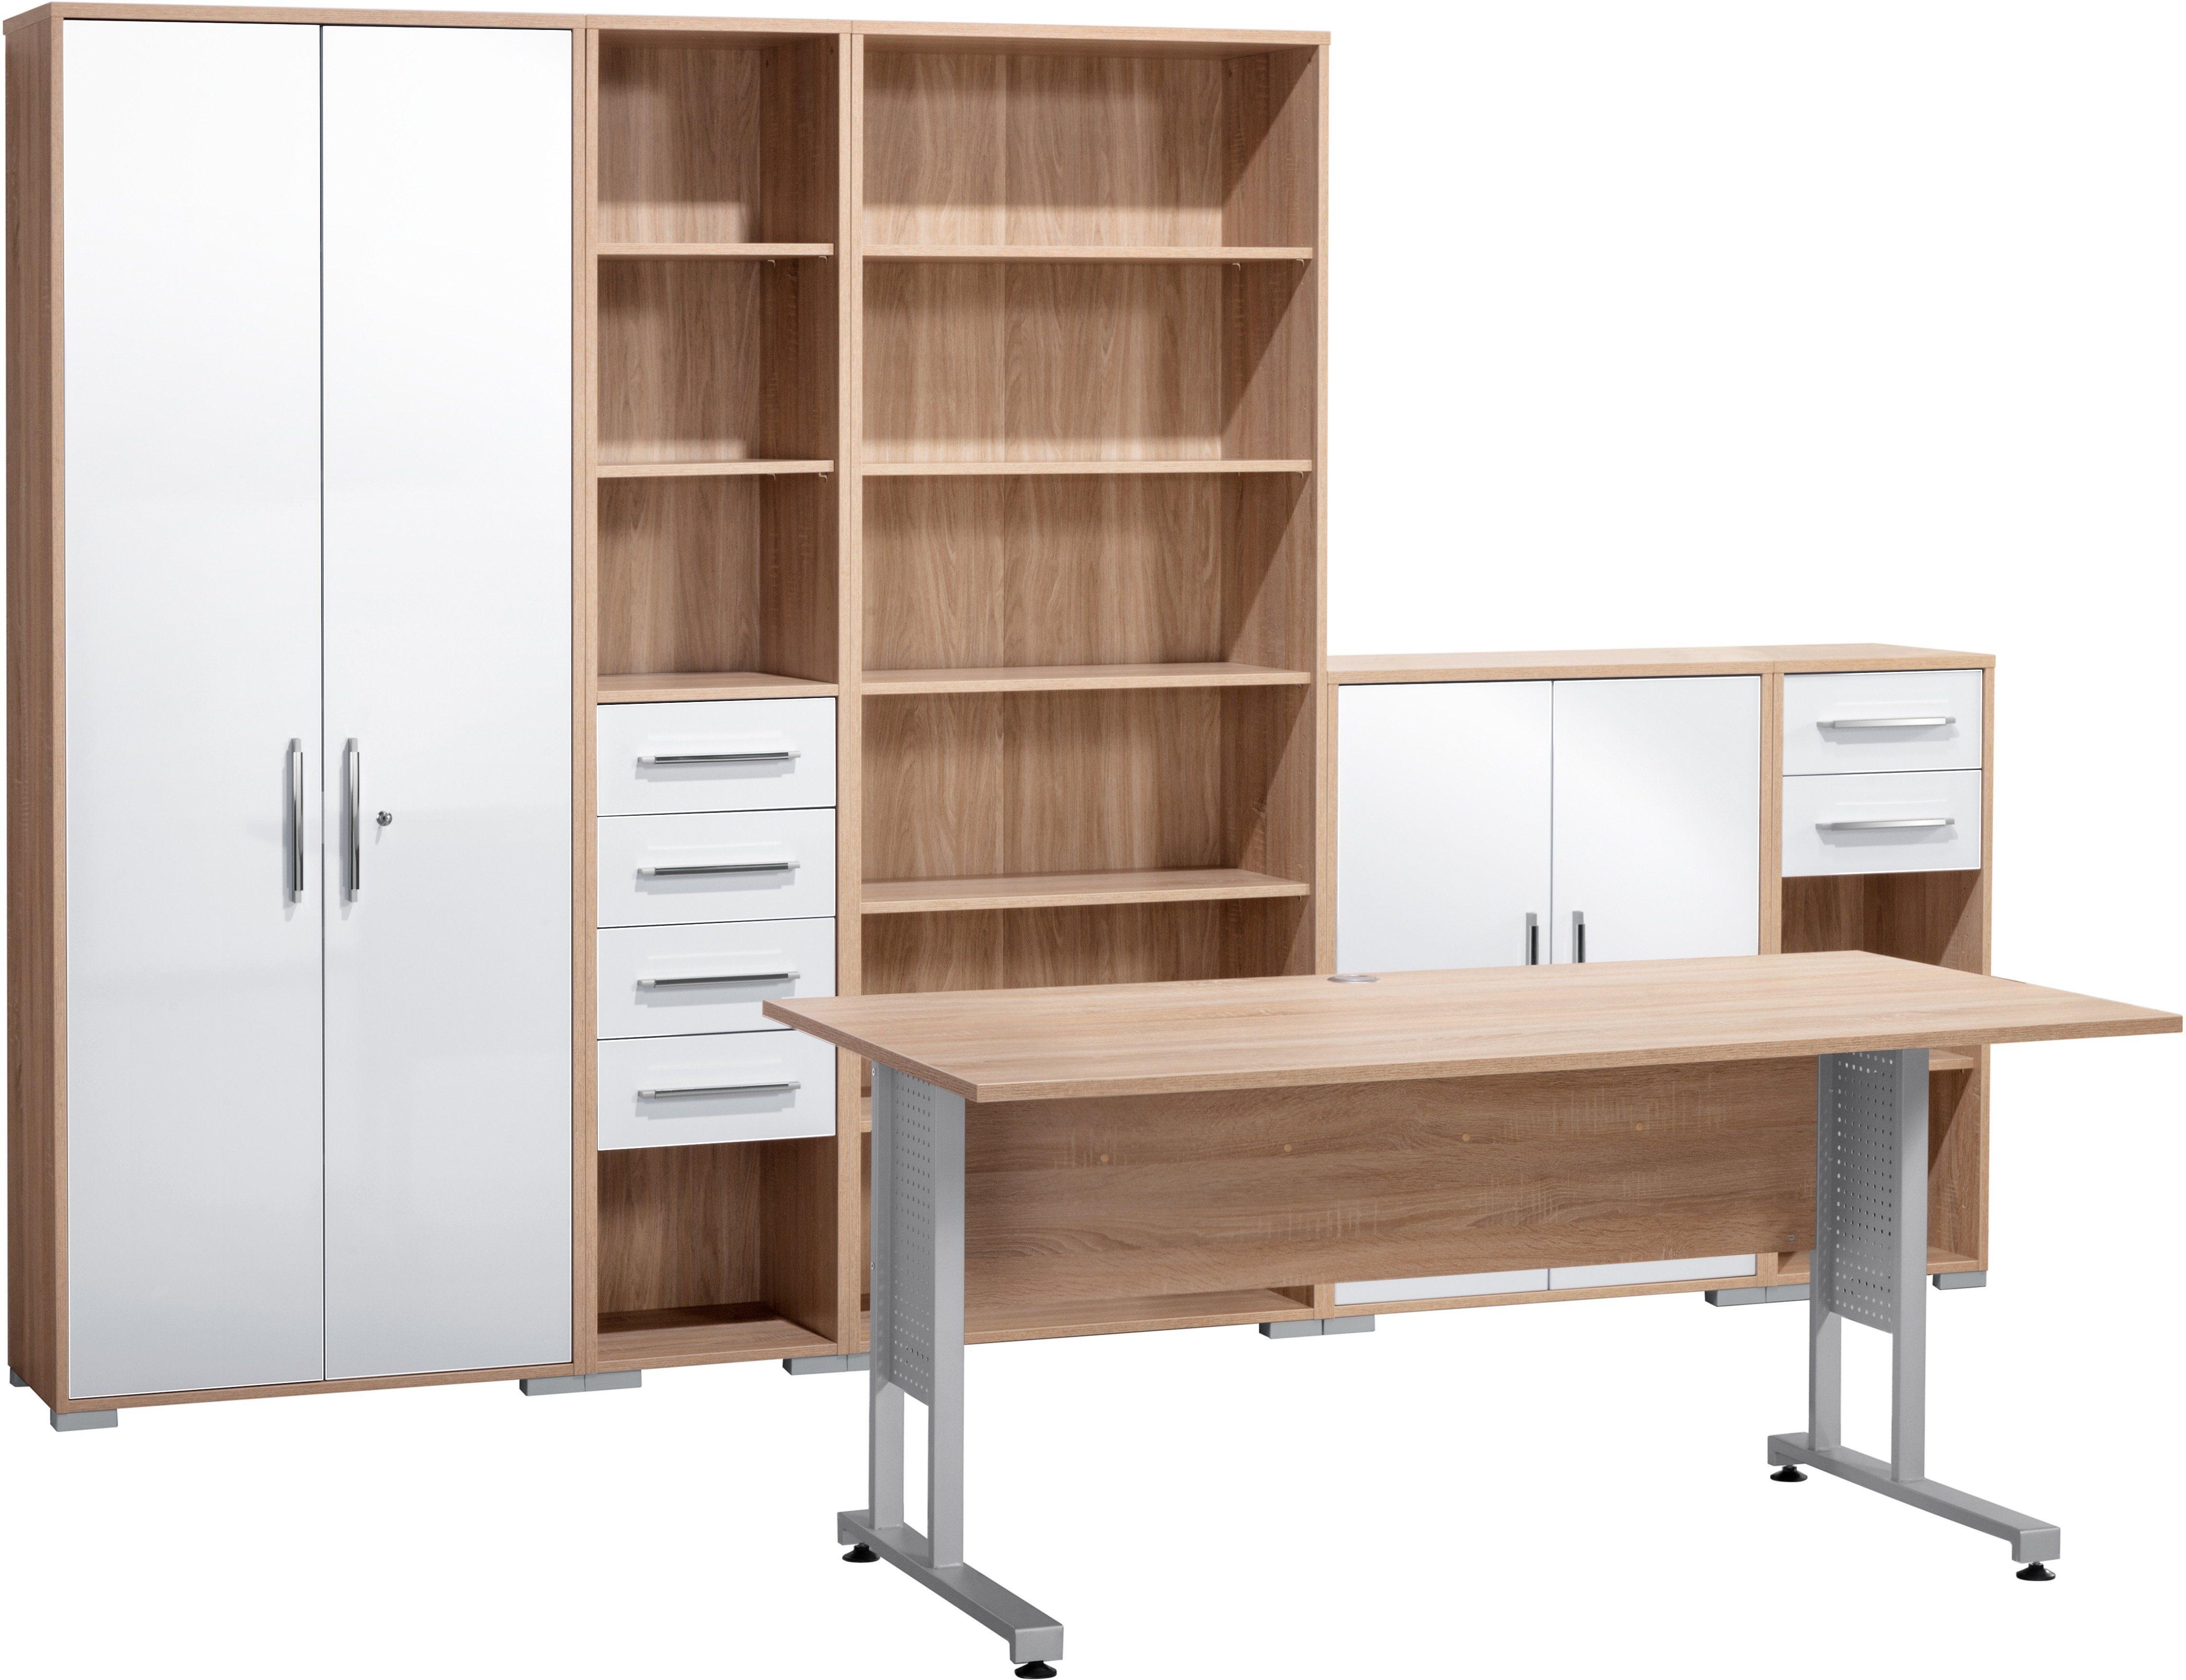 Maja Möbel Büromöbel-Set (6-tlg.) »1200« | Büro > Büromöbel-Serien | Weiß - Hochglanz - Grau | Hochglanz - Glänzend - Metall - Abs | Maja Möbel